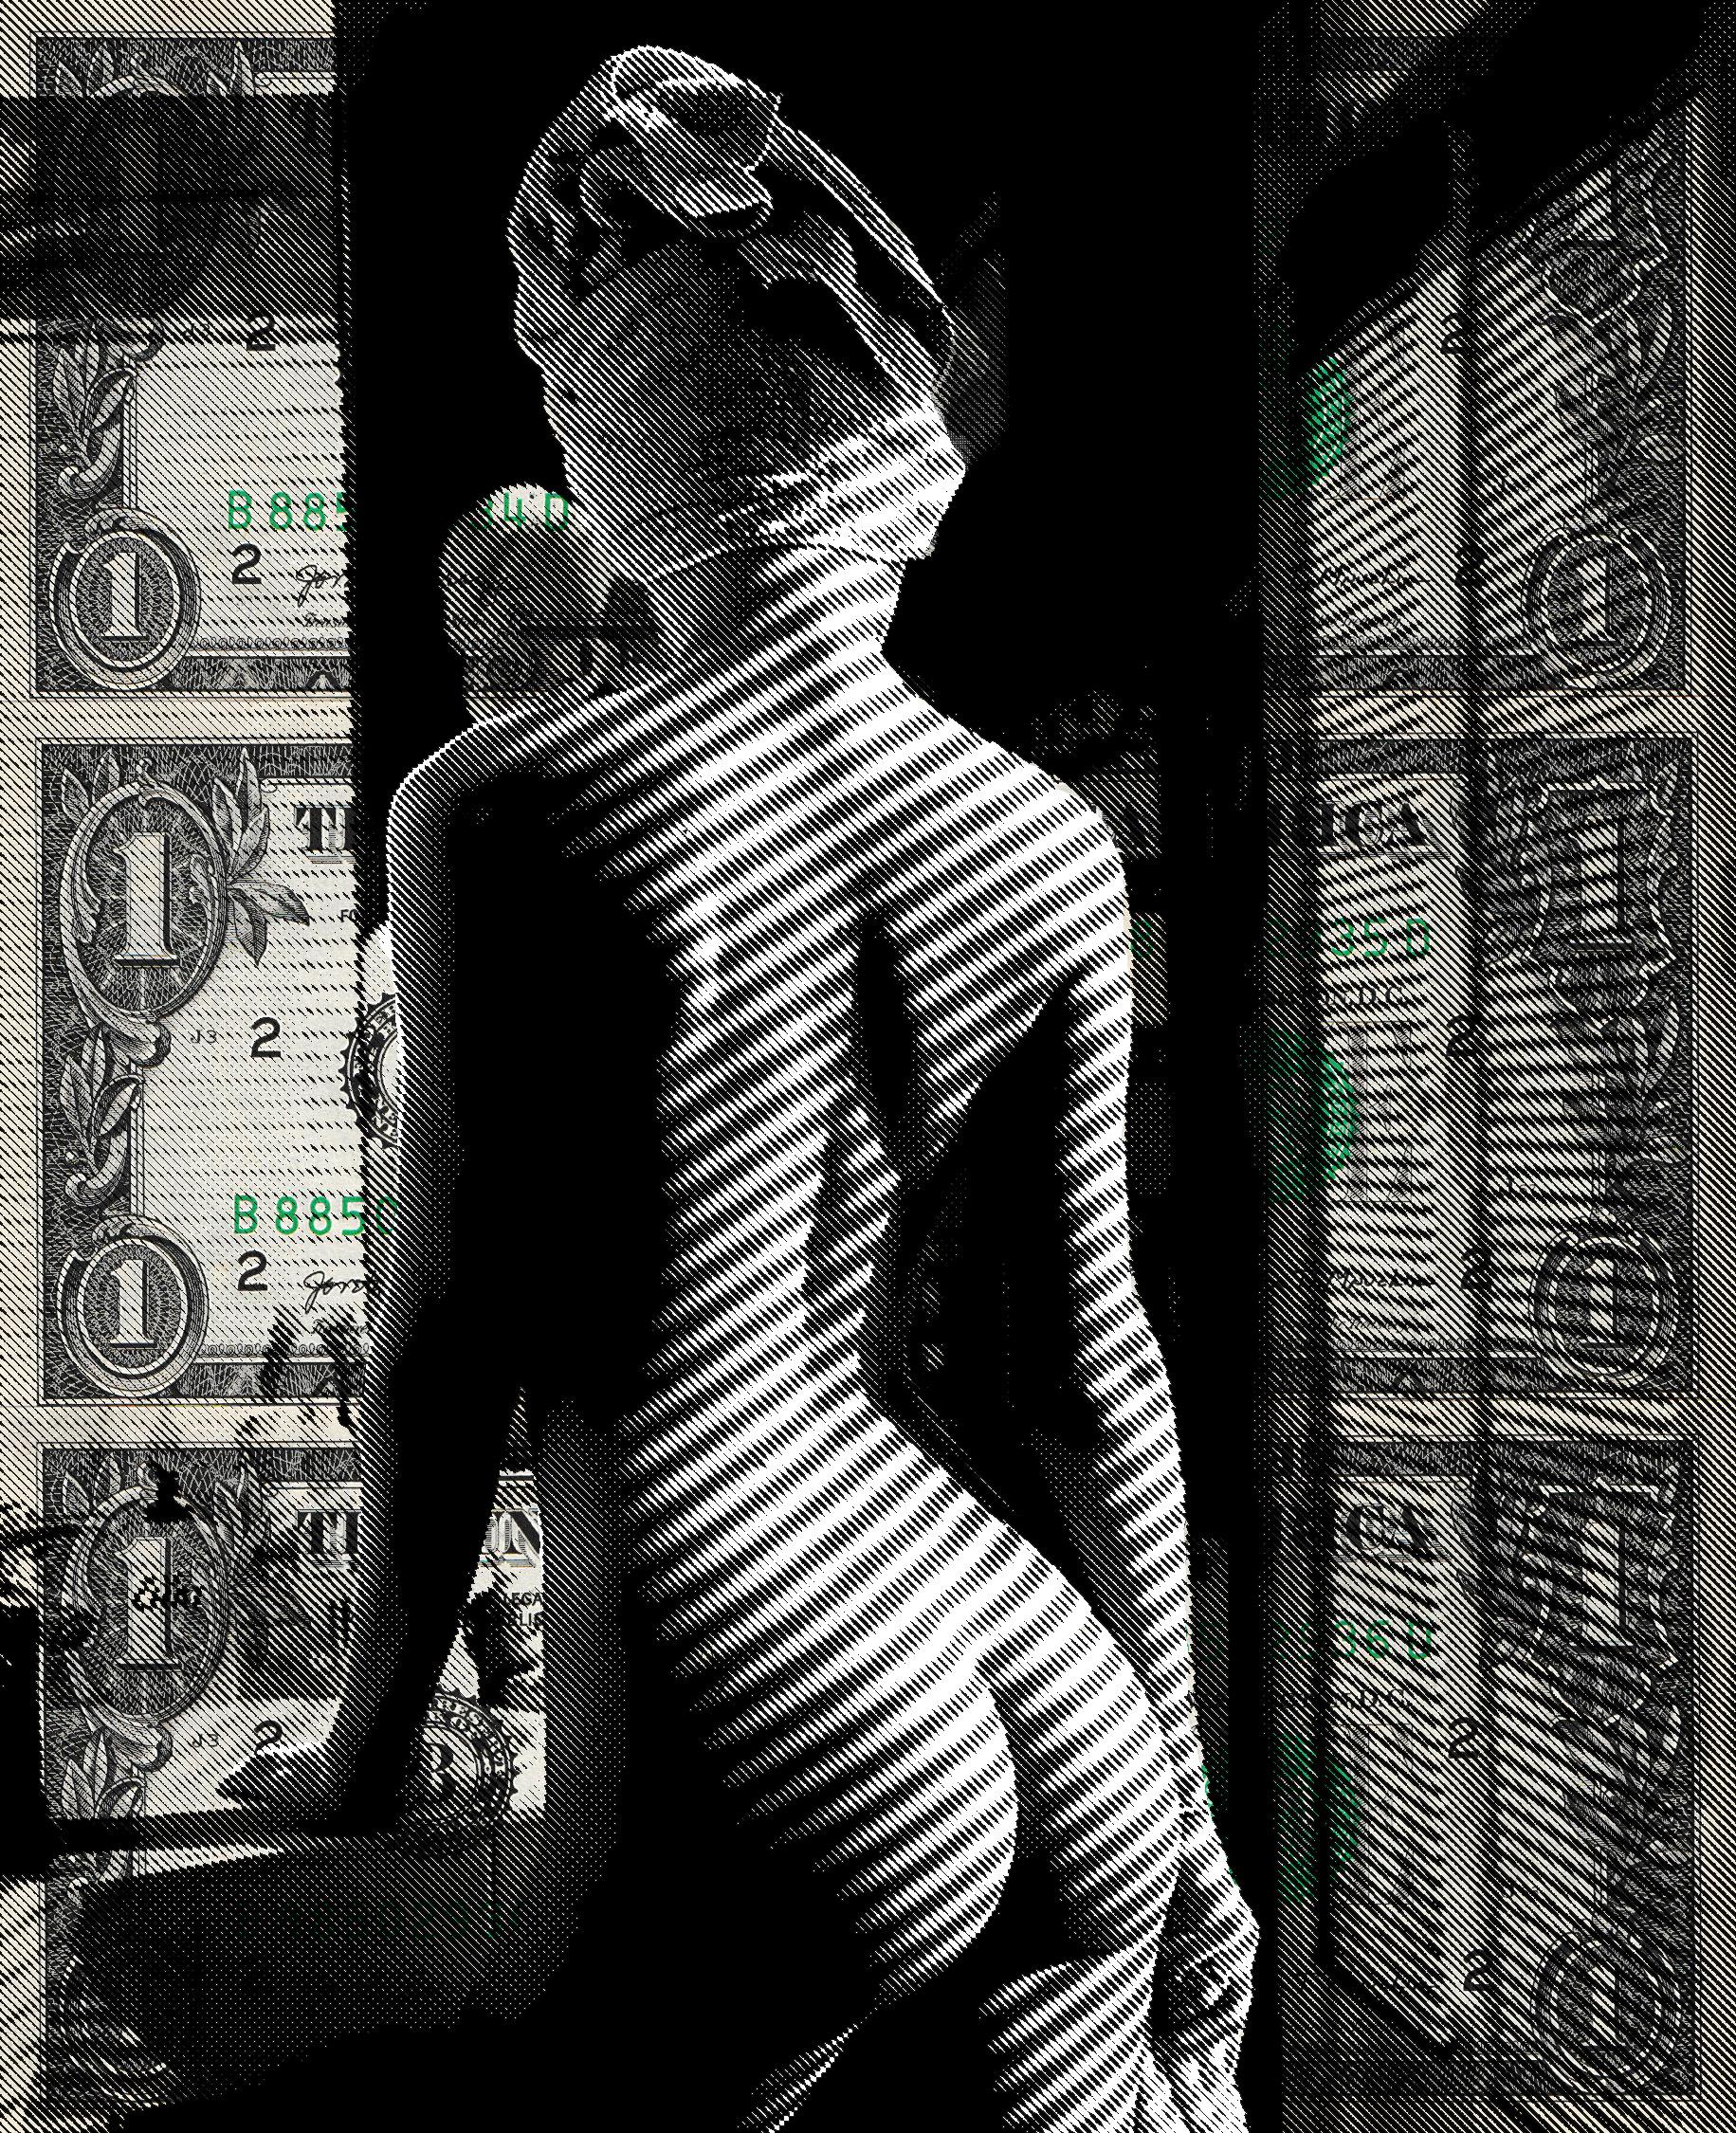 CHRISTOPHER HENRY ' SOIR D'ETE ' - 2020 - Image 4 of 7